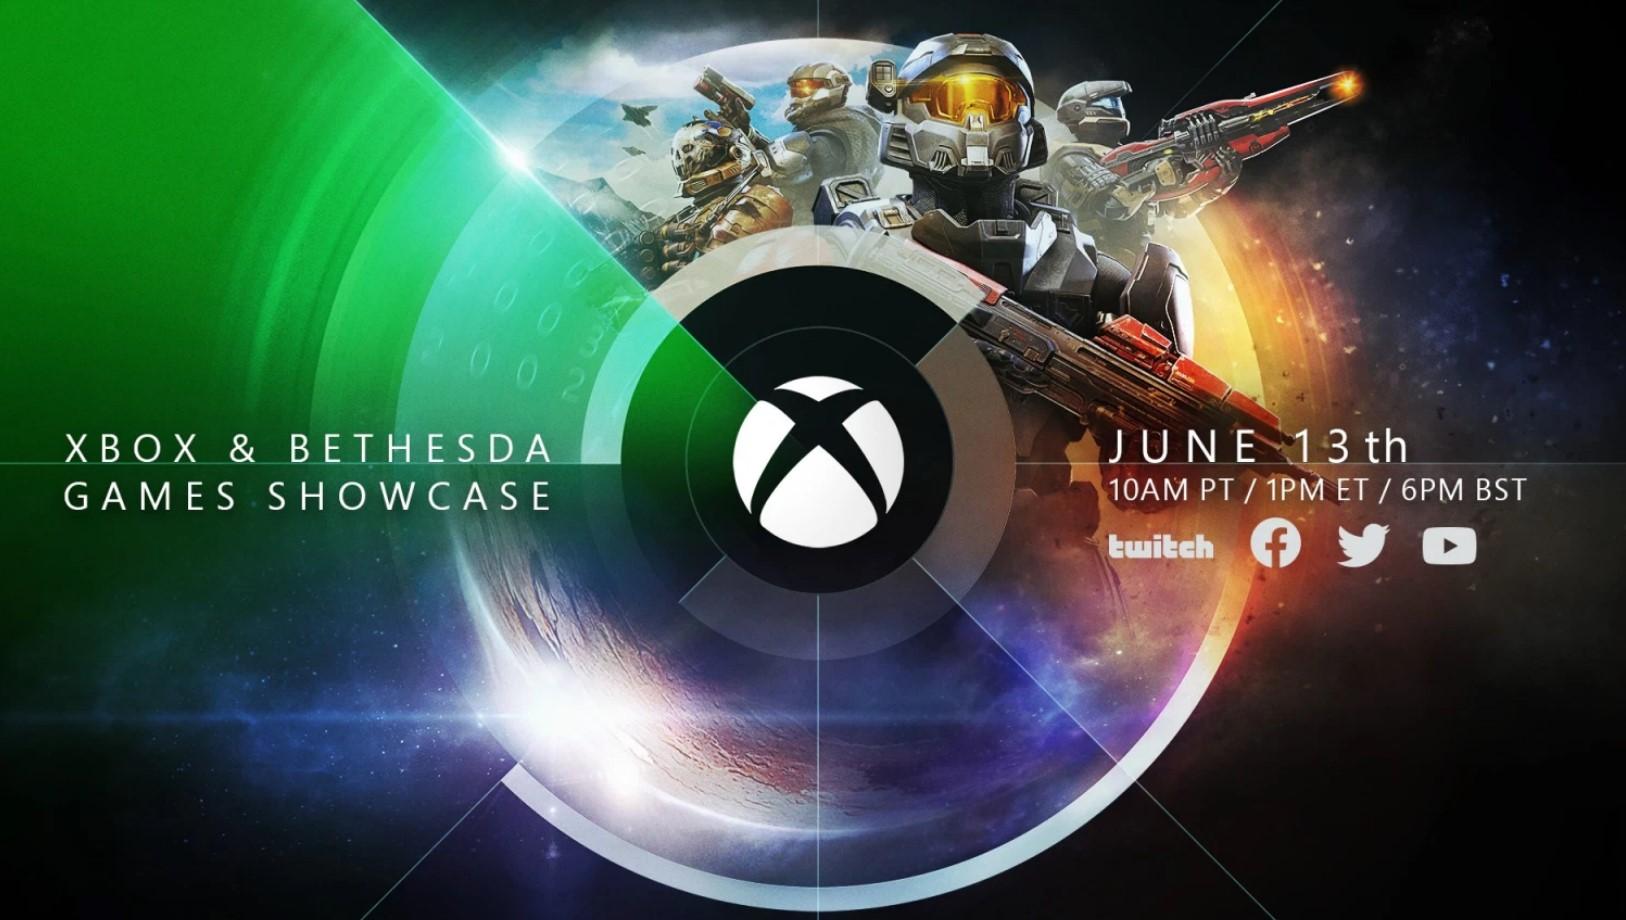 Xbox Bethesda Games Showcase